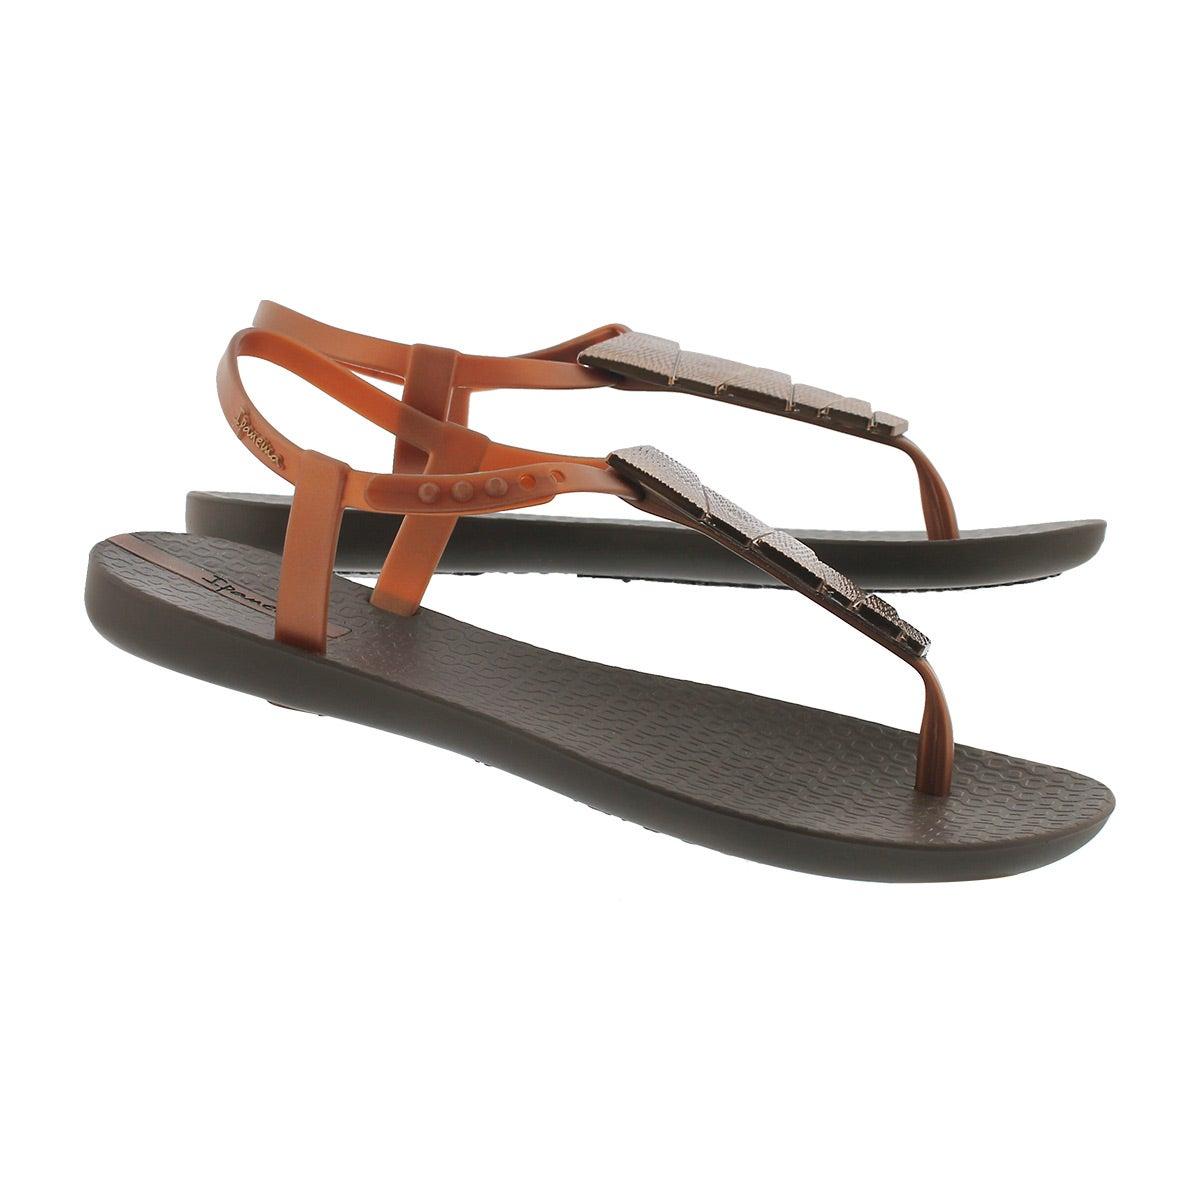 Lds Charm V Sand brn/brz t-strap sandal